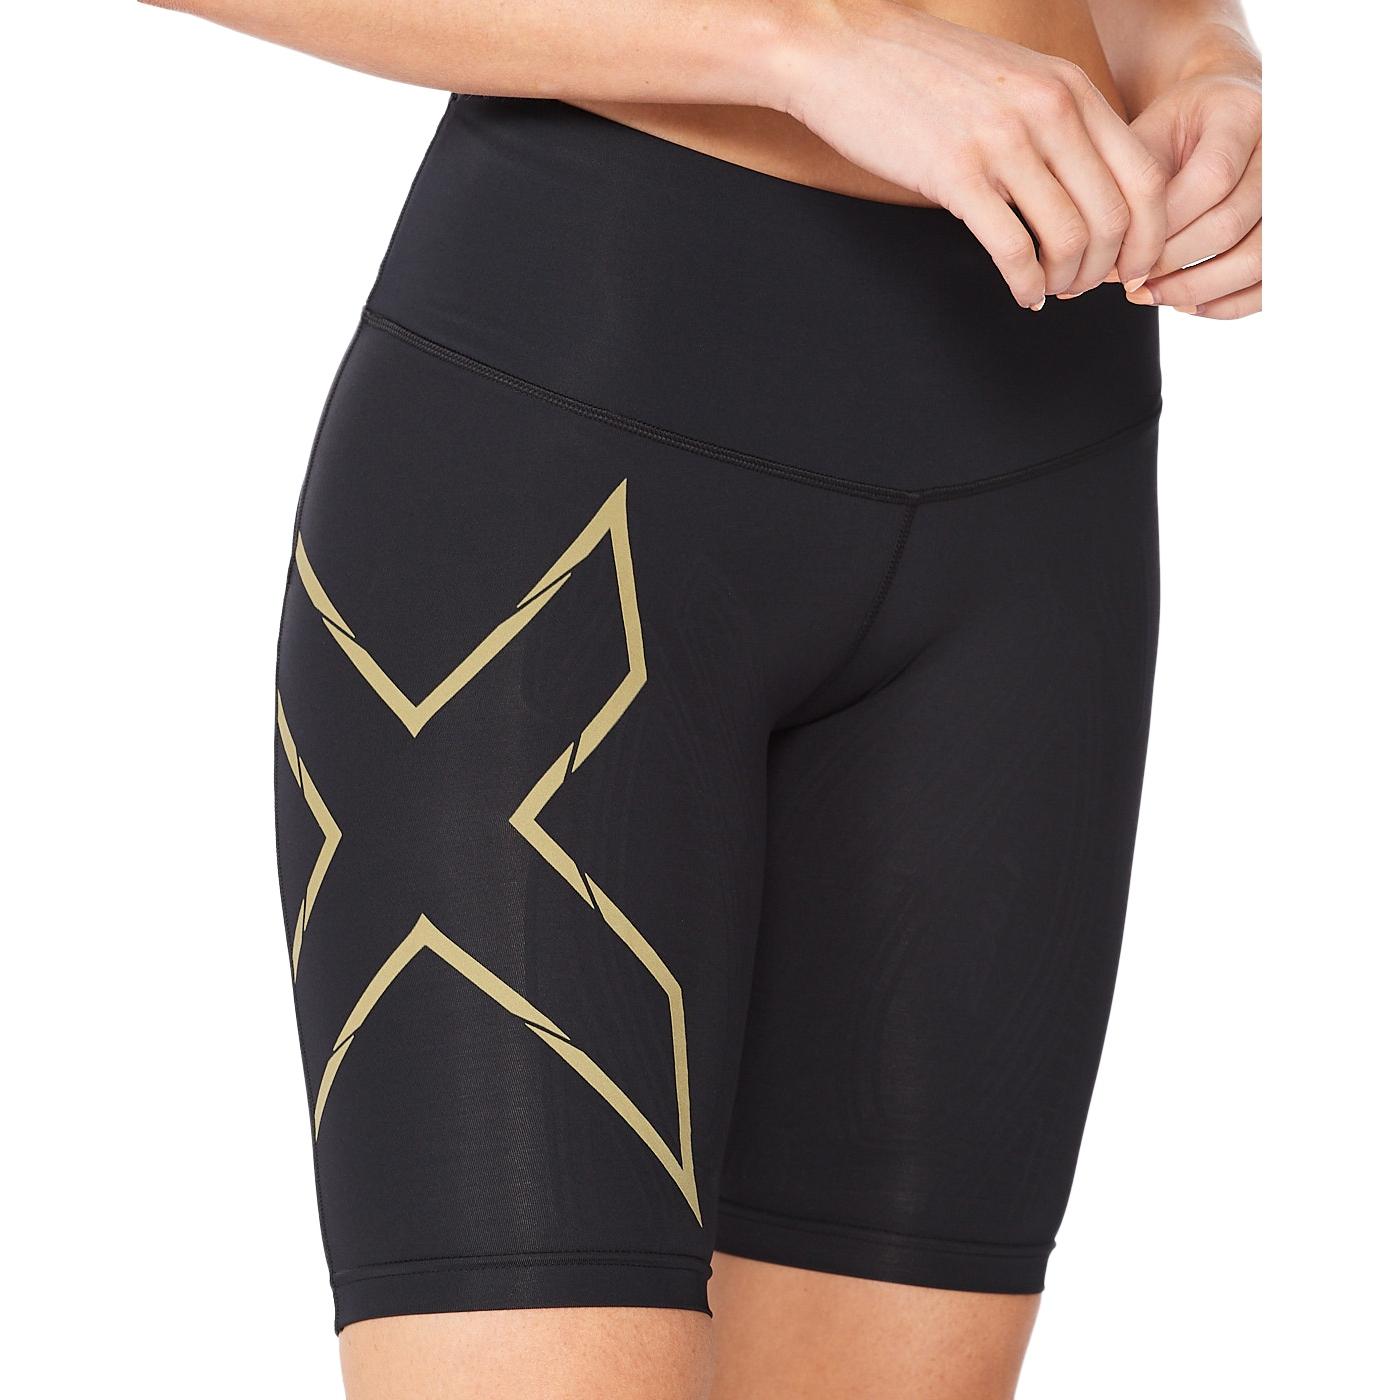 Imagen de 2XU Light Speed Mid-Rise Compression Pantalon corto para mujer - black/gold reflective